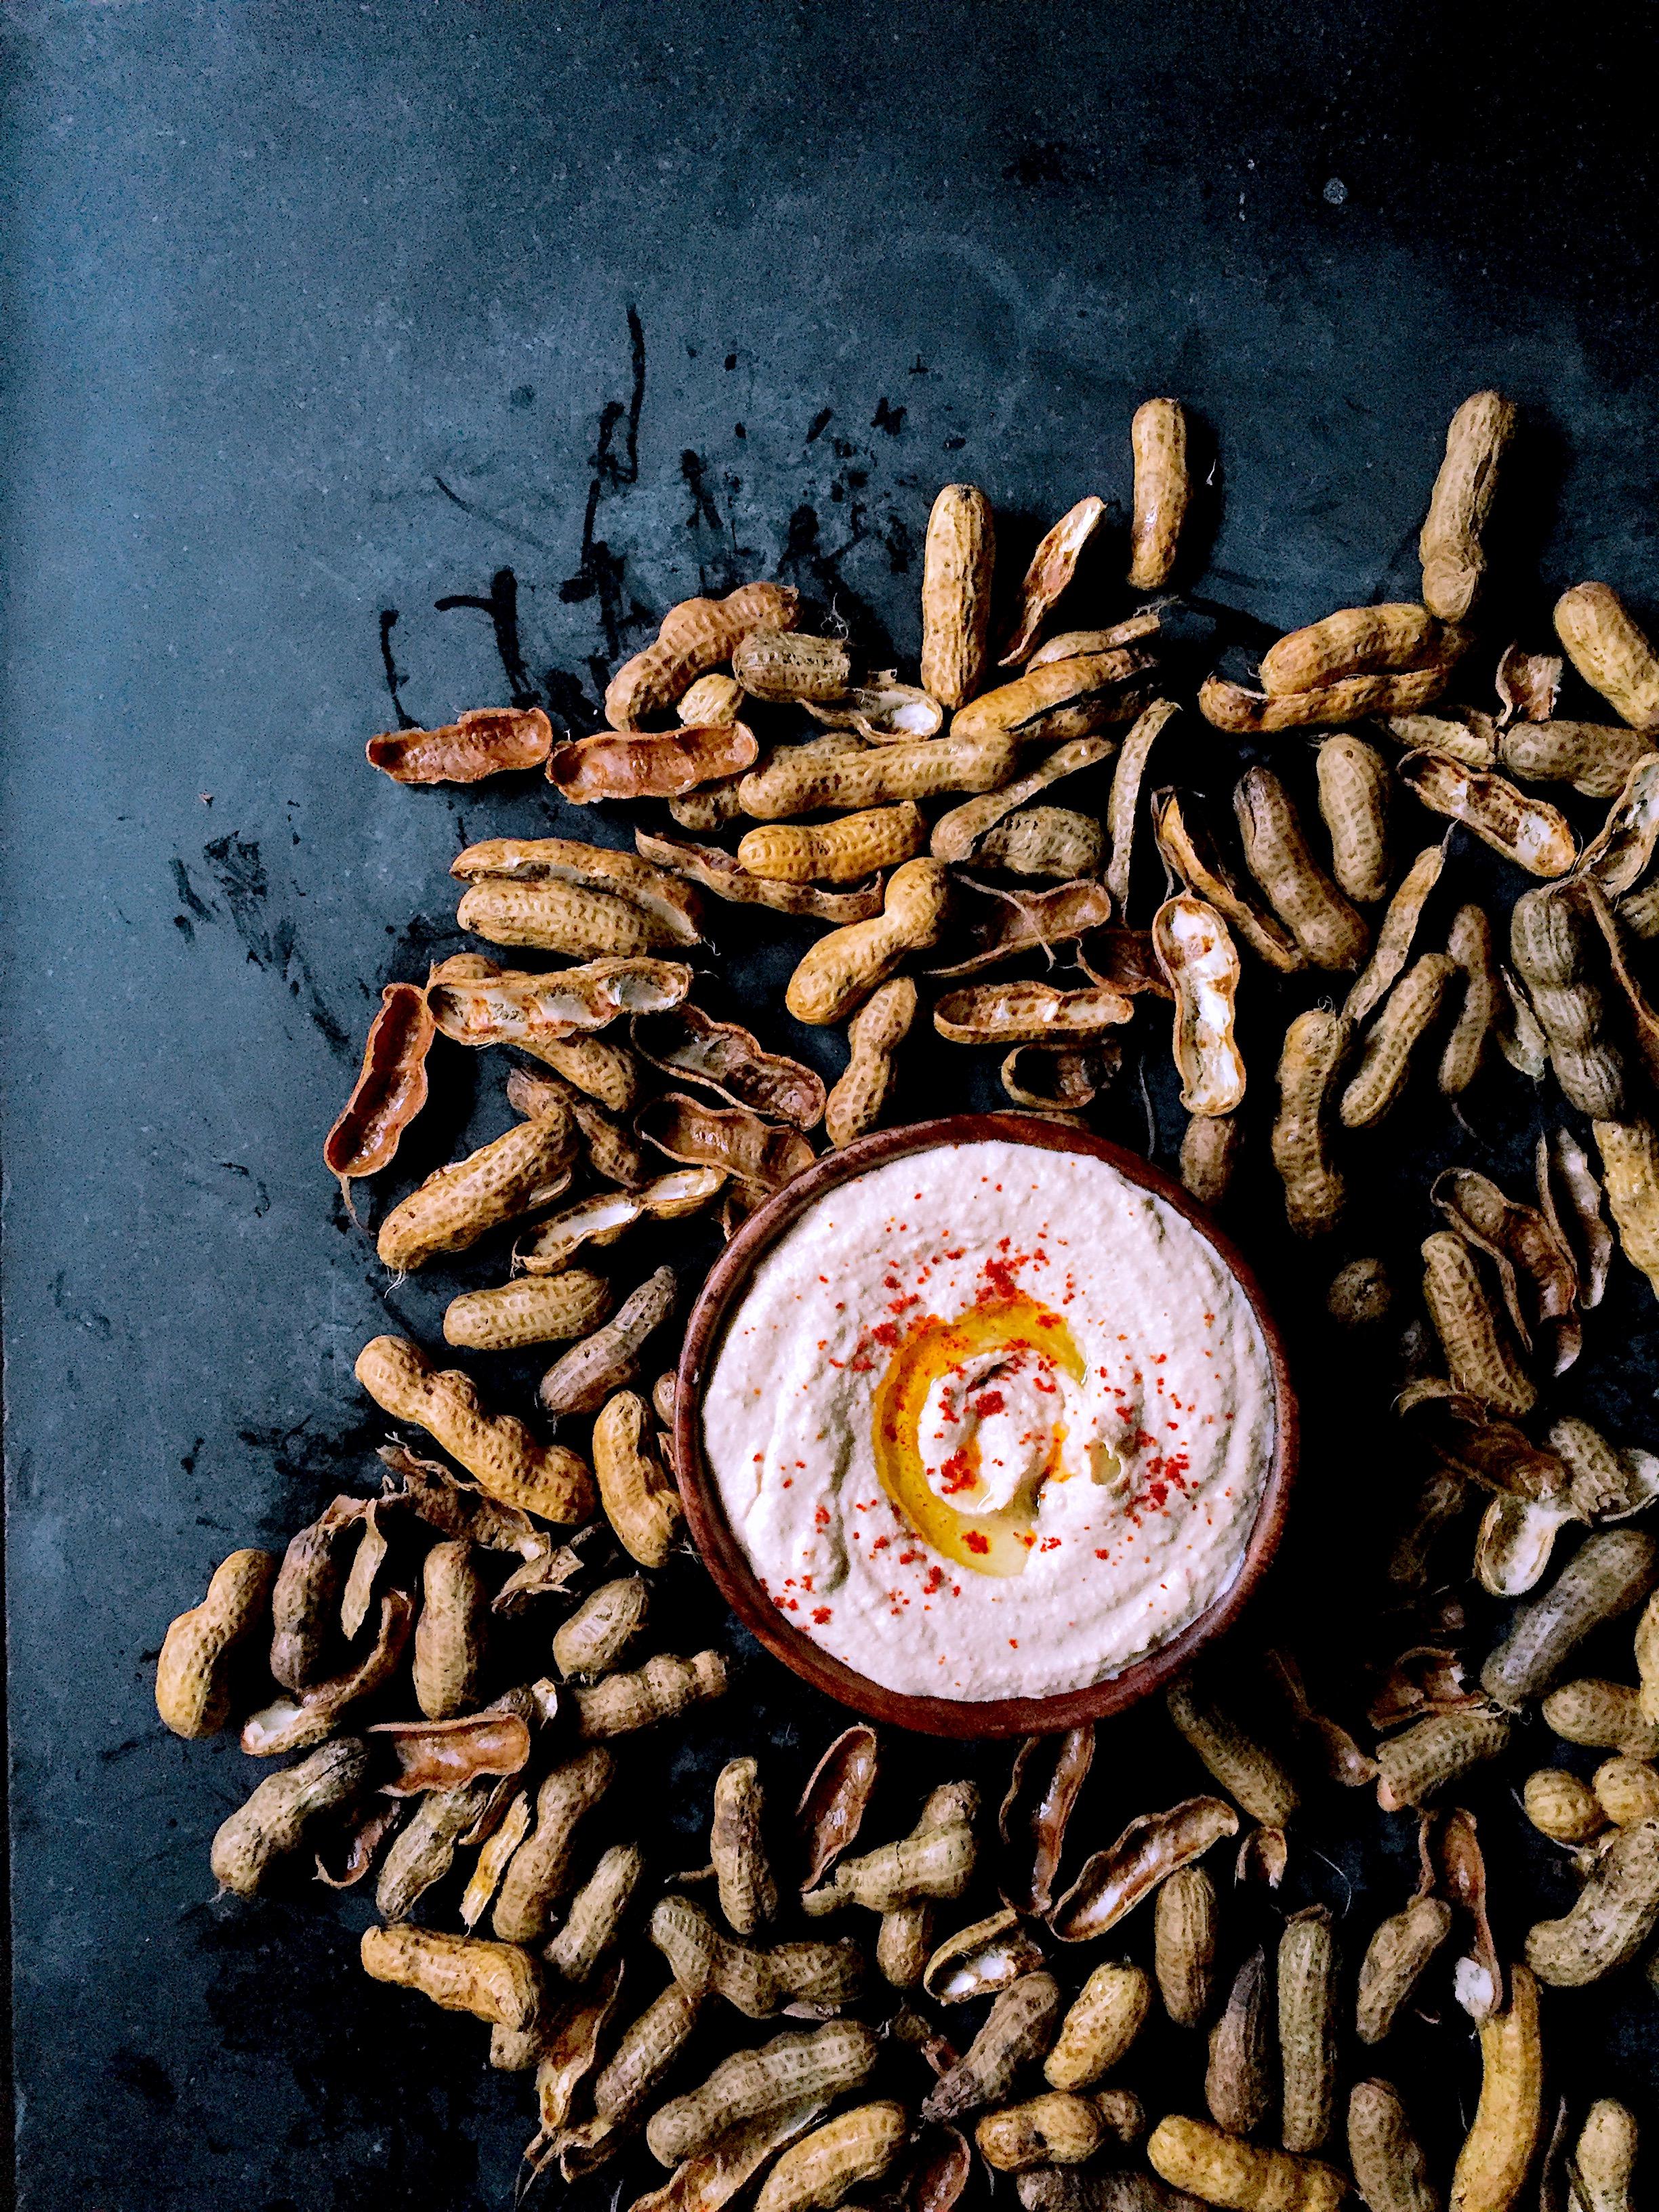 A Very Good Basic Hummus Recipe + My Groundnut Hummus